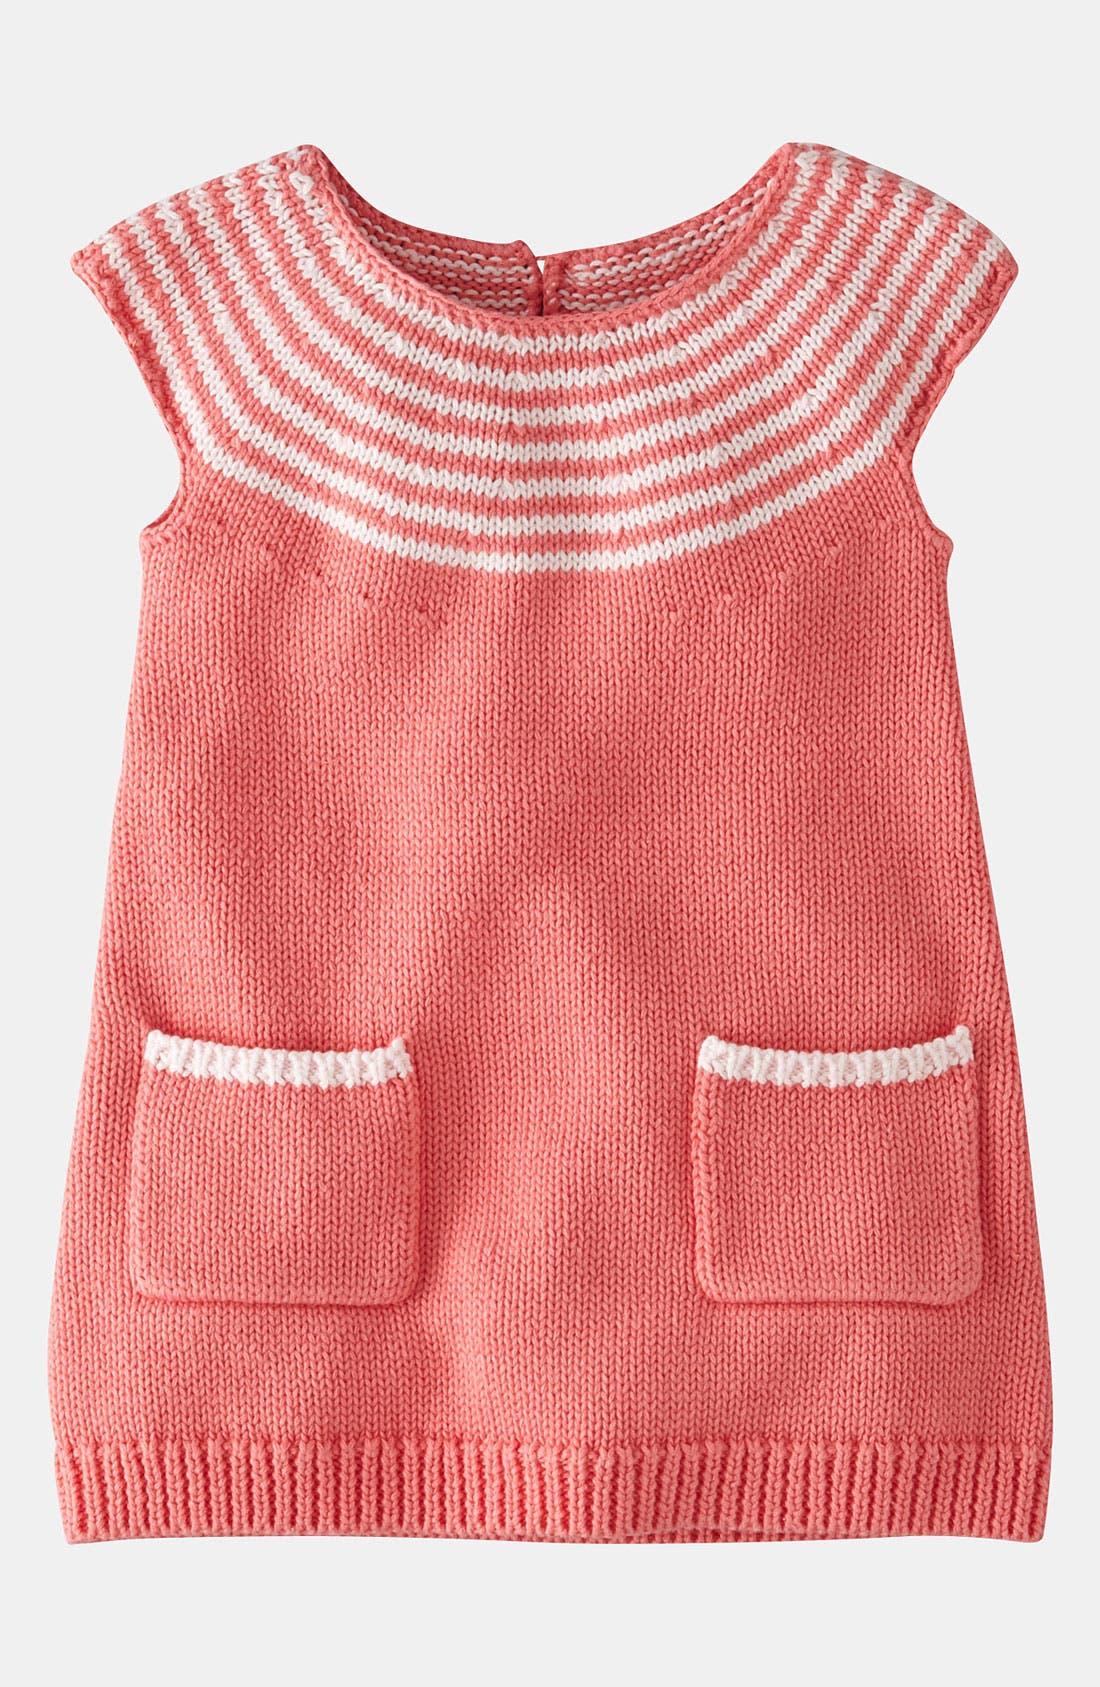 Main Image - Mini Boden Knit Dress (Baby)